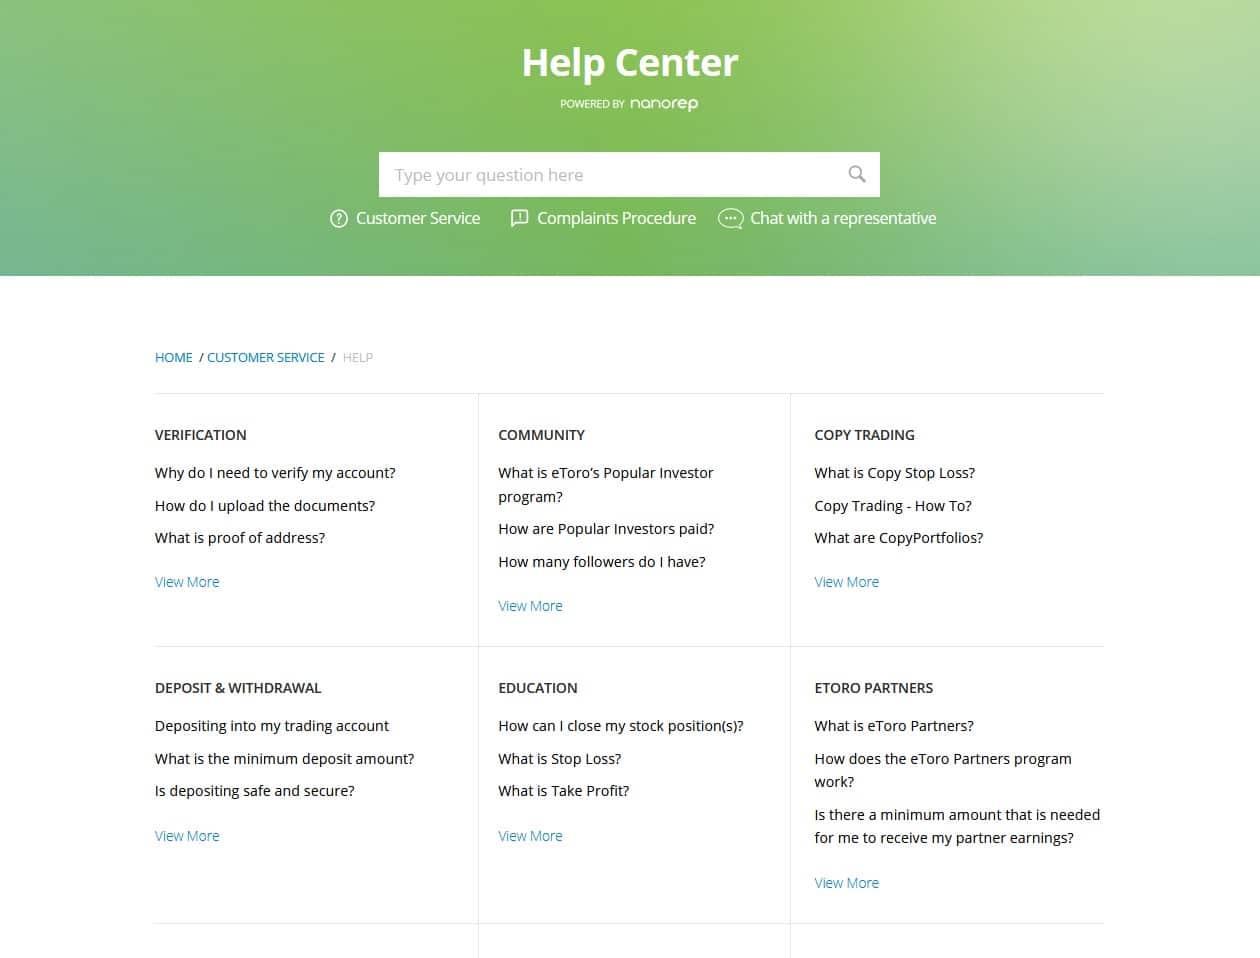 eToro Help Center